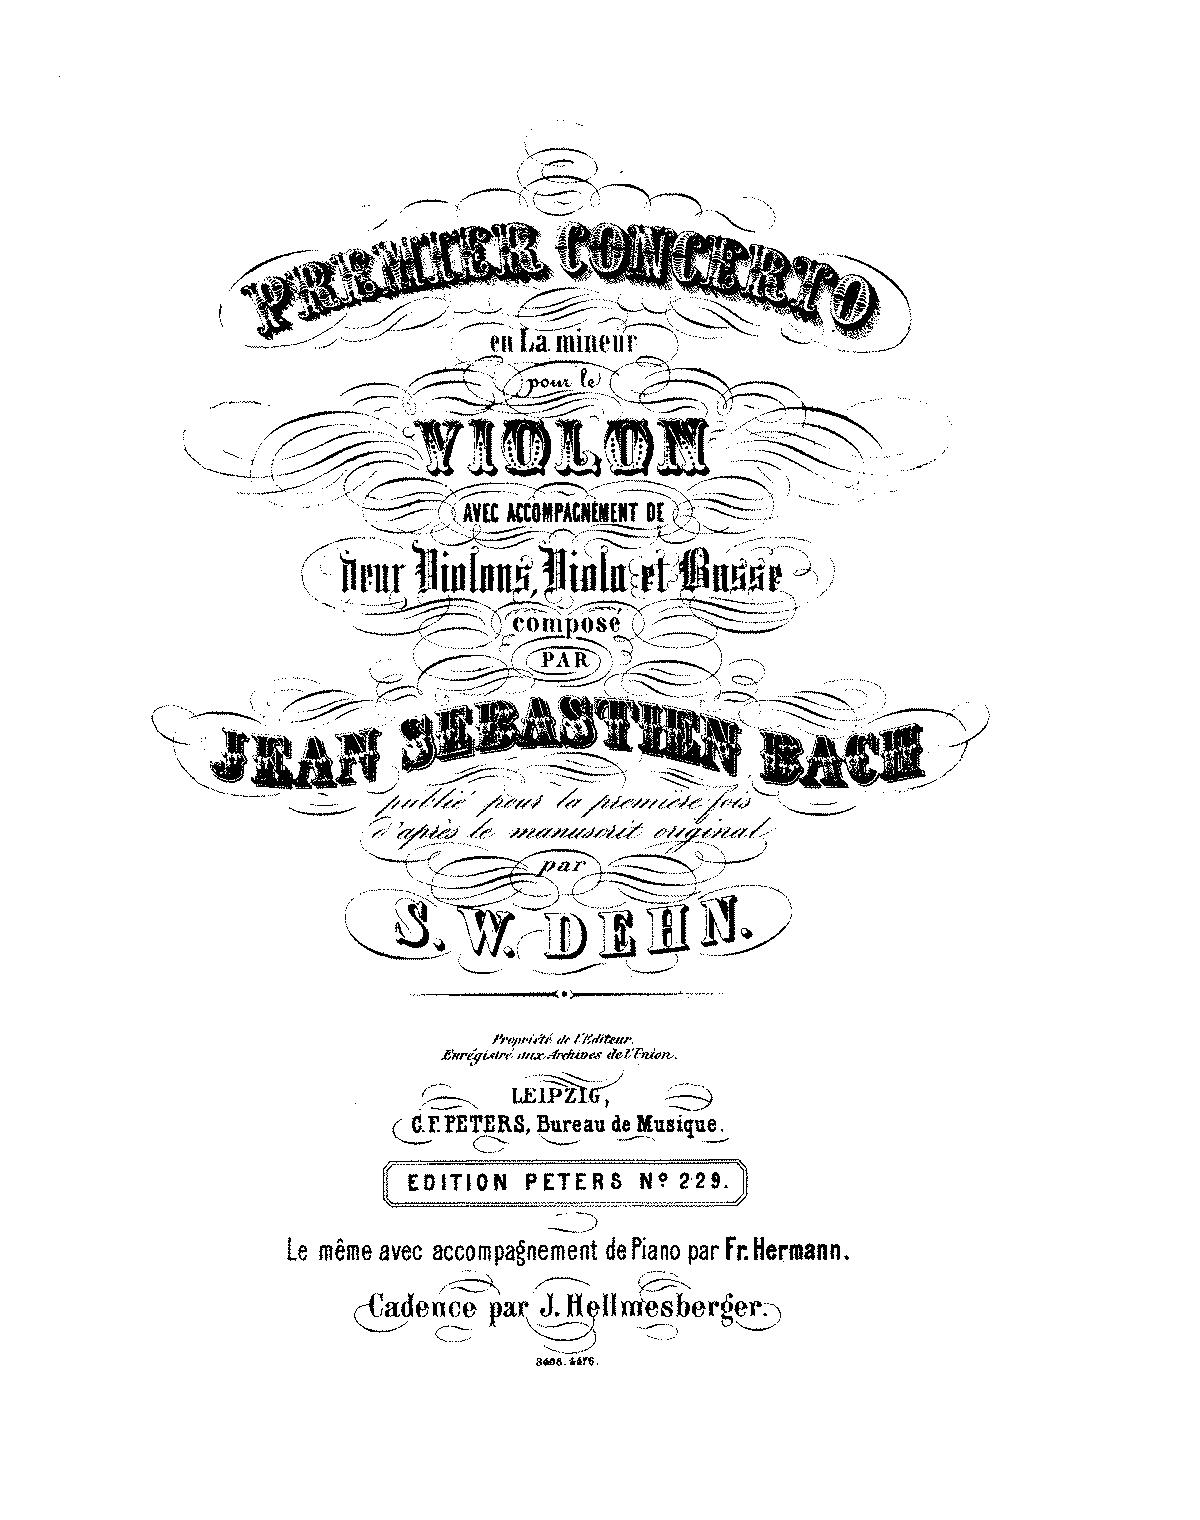 Violin Concerto in A minor, BWV 1041 (Bach, Johann